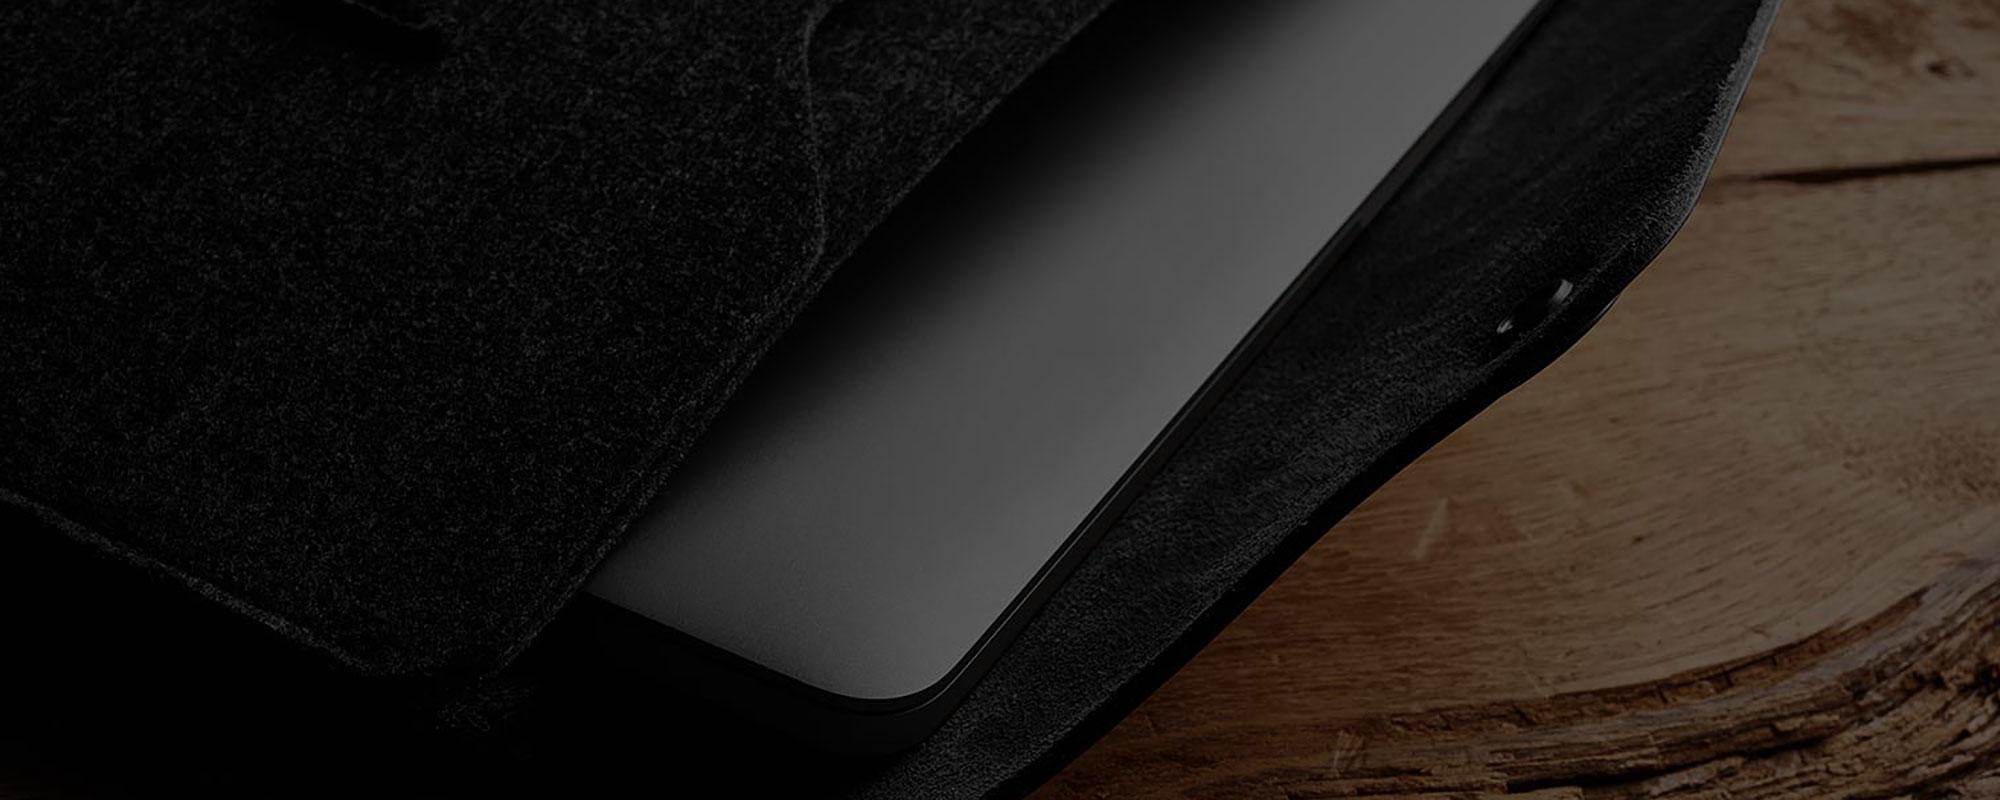 sleeve macbook pro